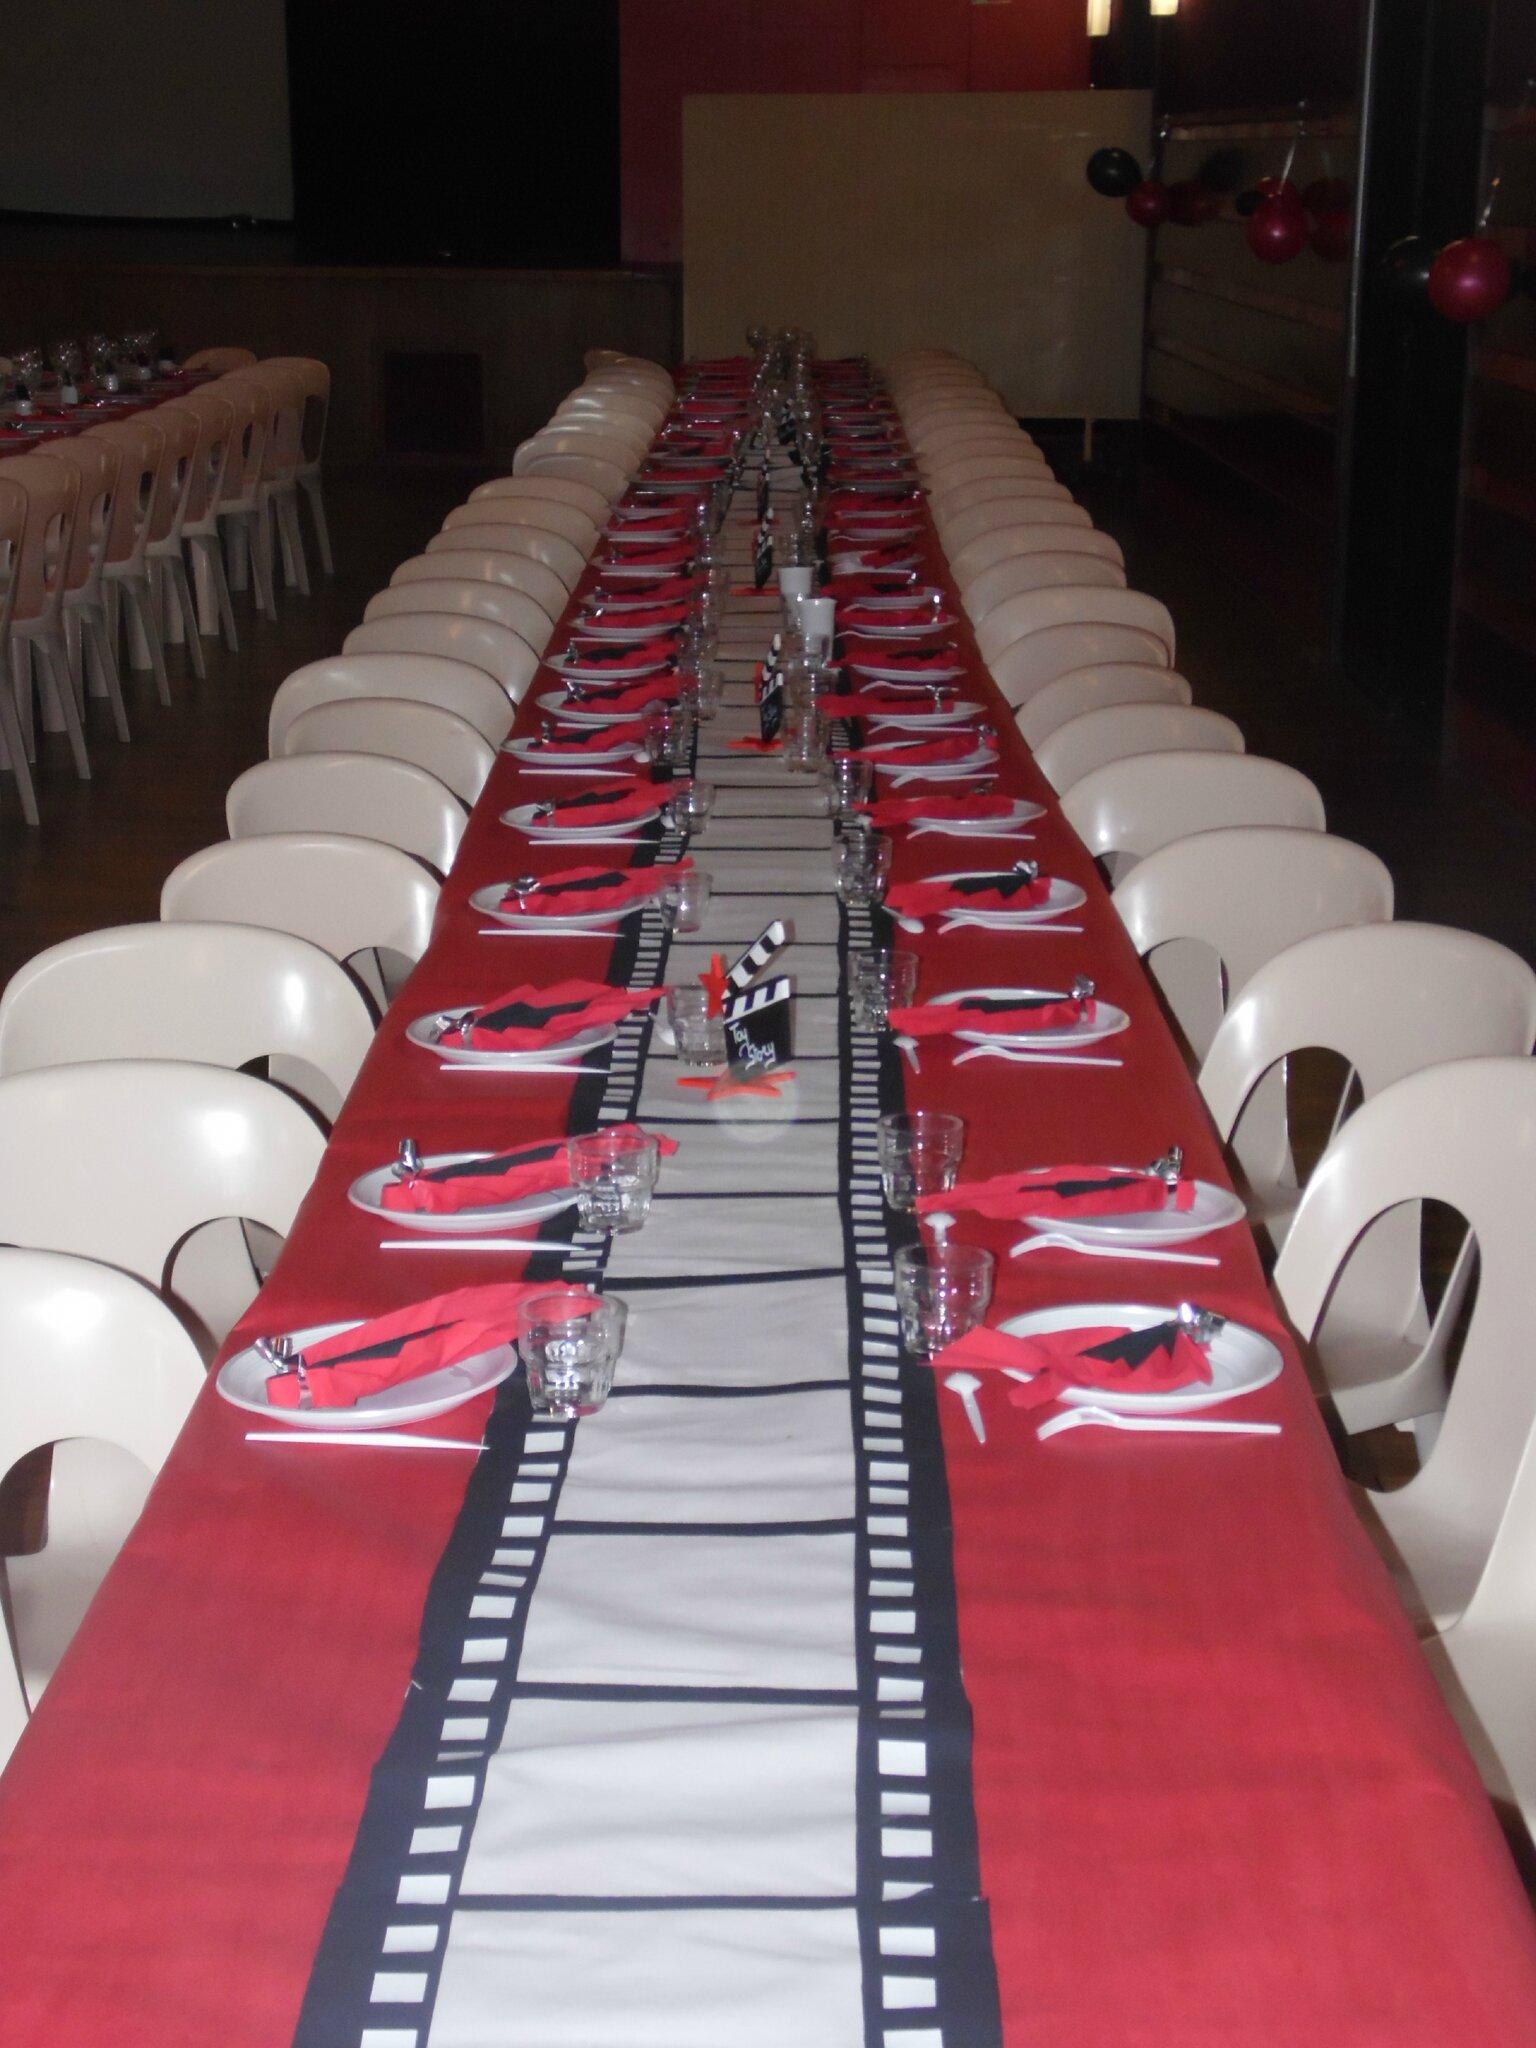 Chemin de table pellicule les ustensiles de cuisine for Table theme cinema